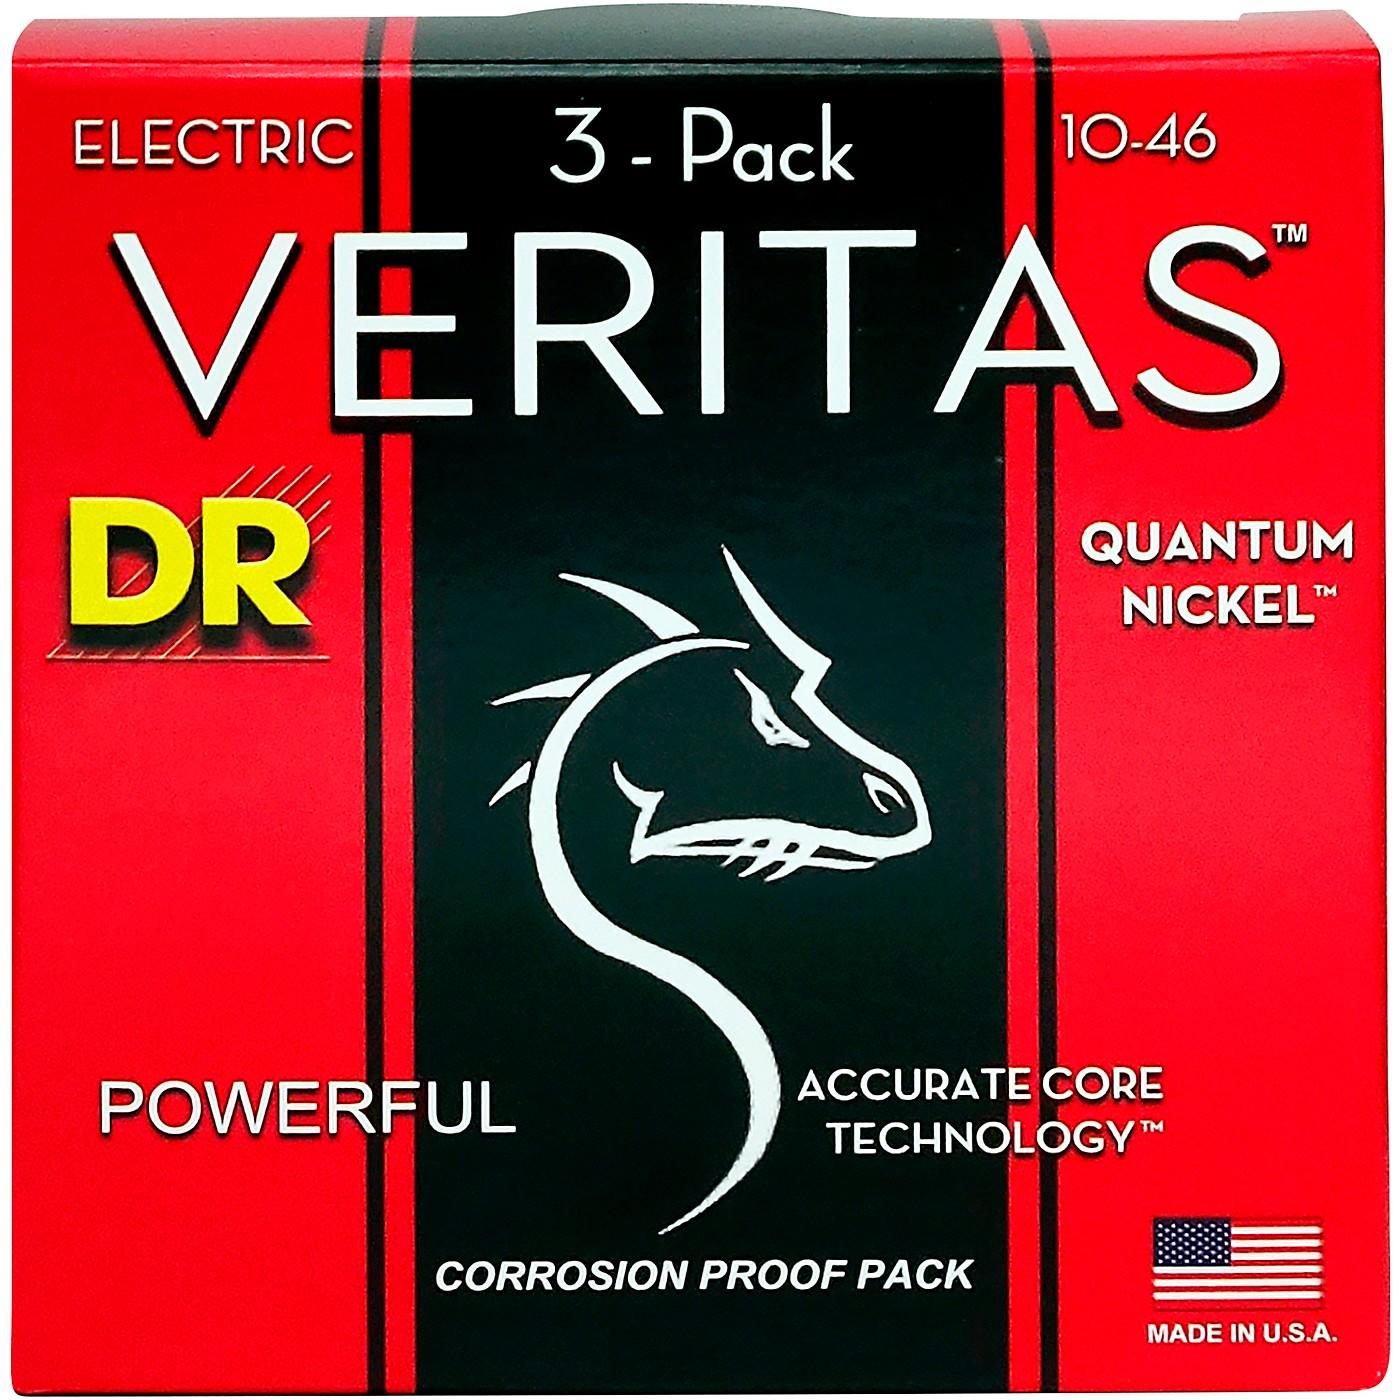 DR Strings Veritas - Accurate Core Technology Medium Electric Guitar Strings (10-46) 3-PACK thumbnail